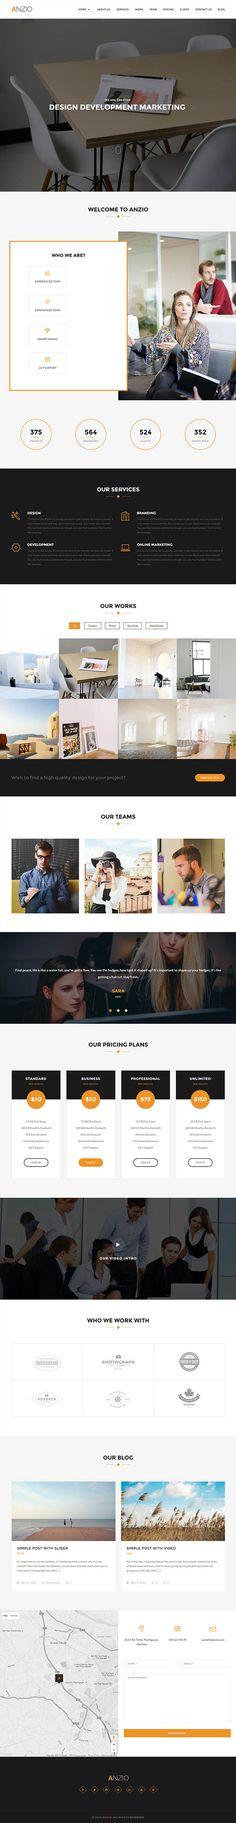 ANZIO – Onepage Parallax WordPress Theme #css3 #html5 #responsivedesign #uidesign #userexperience #wordpressthemes